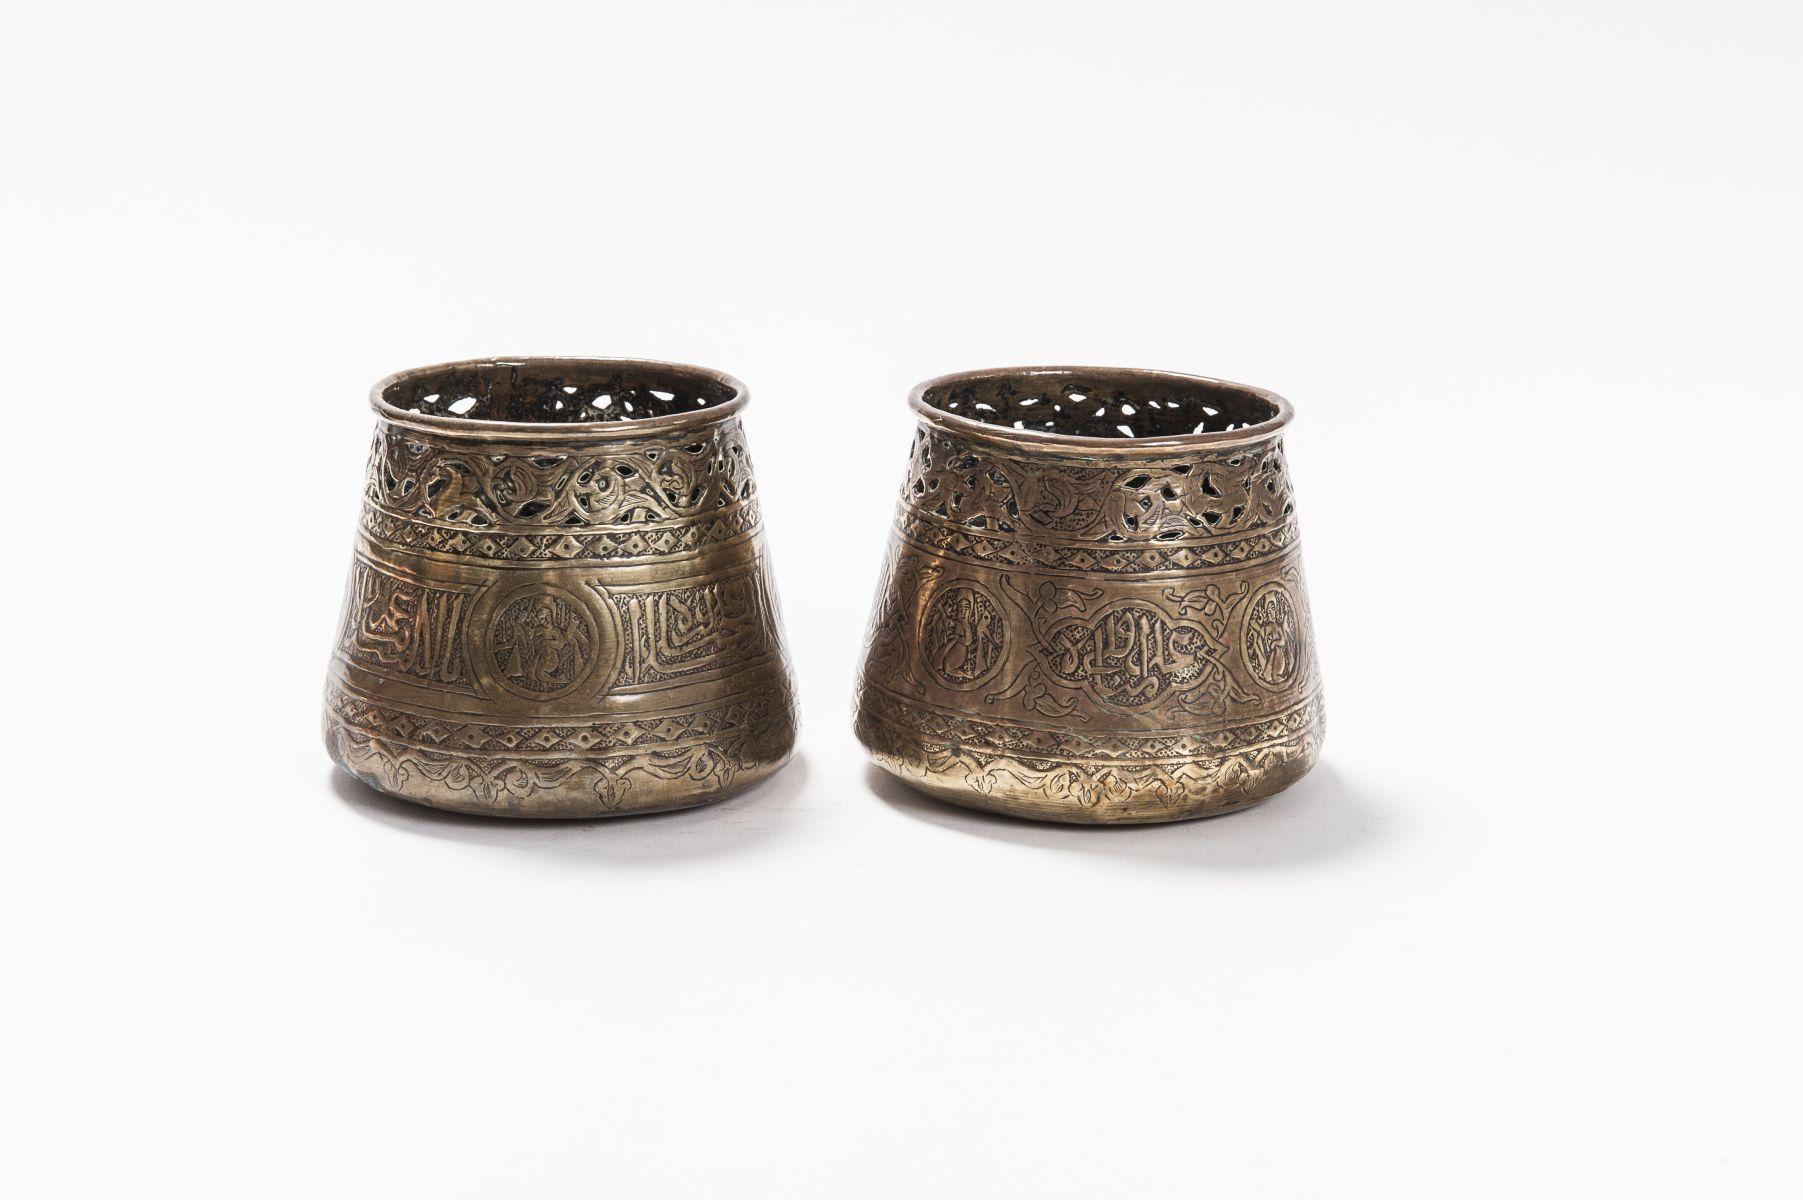 #186 Two decorative Indo-Persian Repoussé copper cups, 19th century | Zwei dekorative indo-persische Repoussé-Kupferbecher, 19. Jahrhundert Image